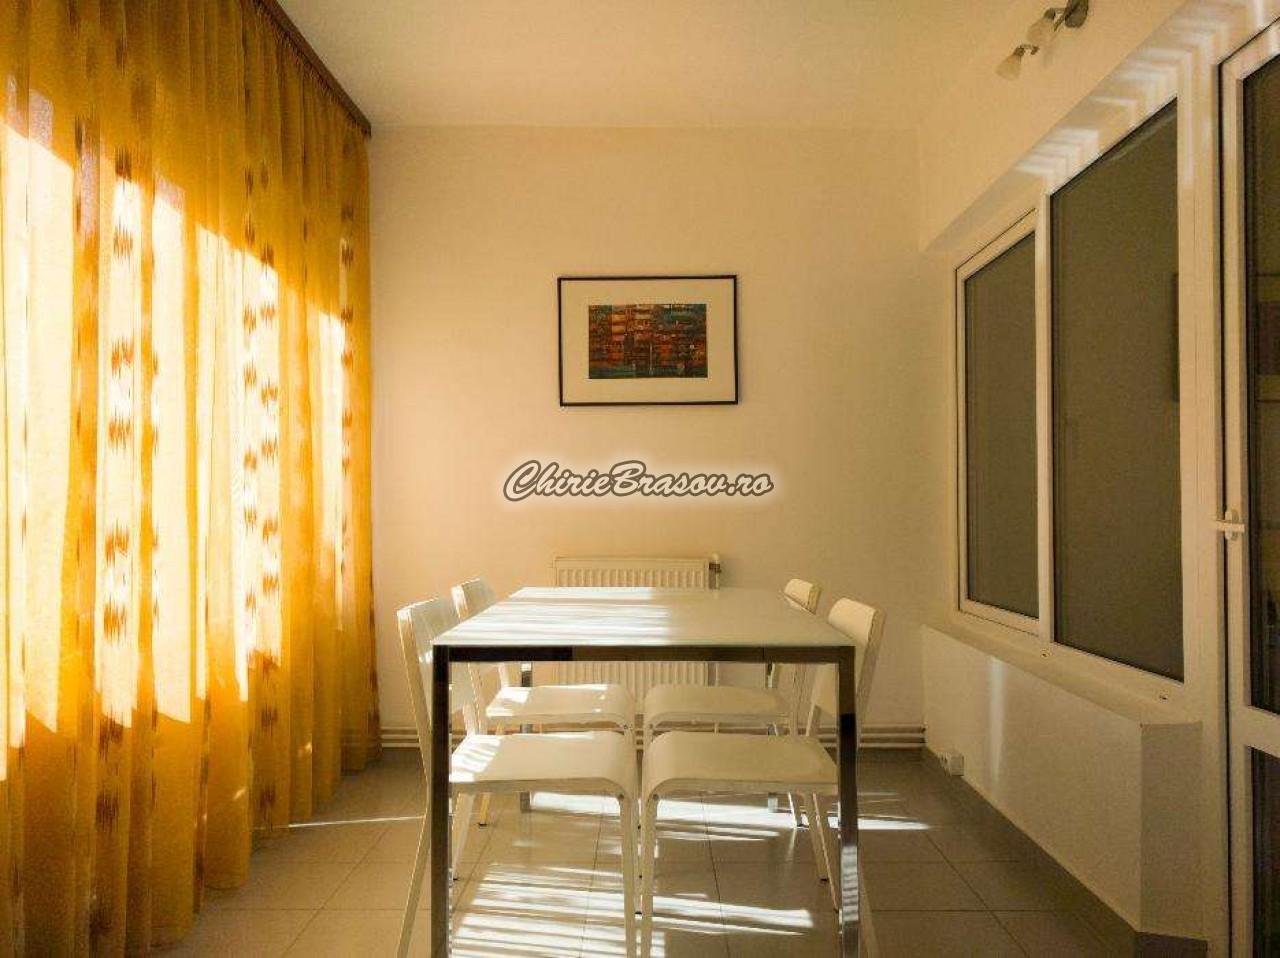 Apartament 2 camere de inchiriat in Brasov ,Central - Onix-352-5